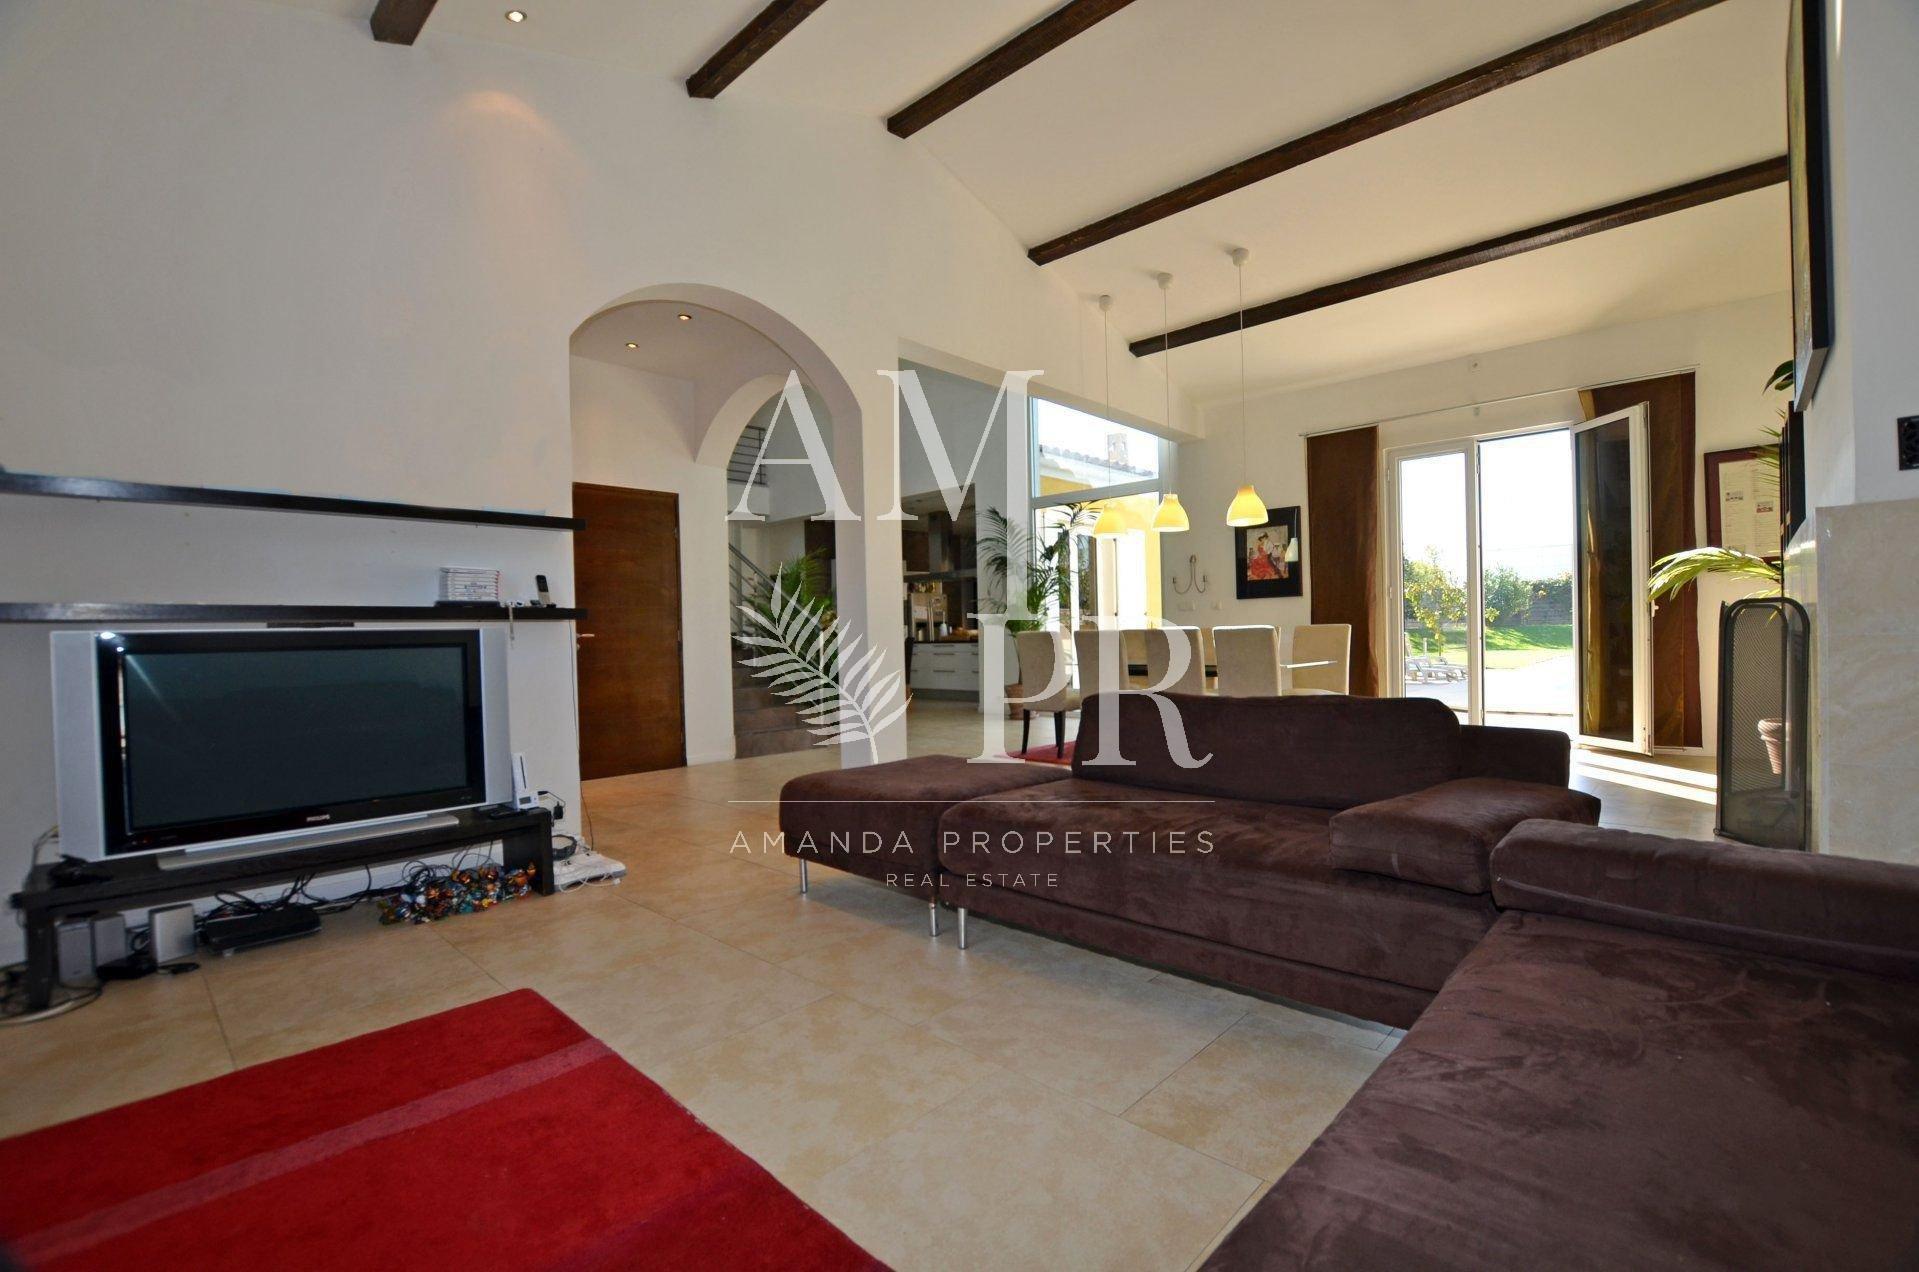 Villa contemporaine - Mougins - Proche des axes